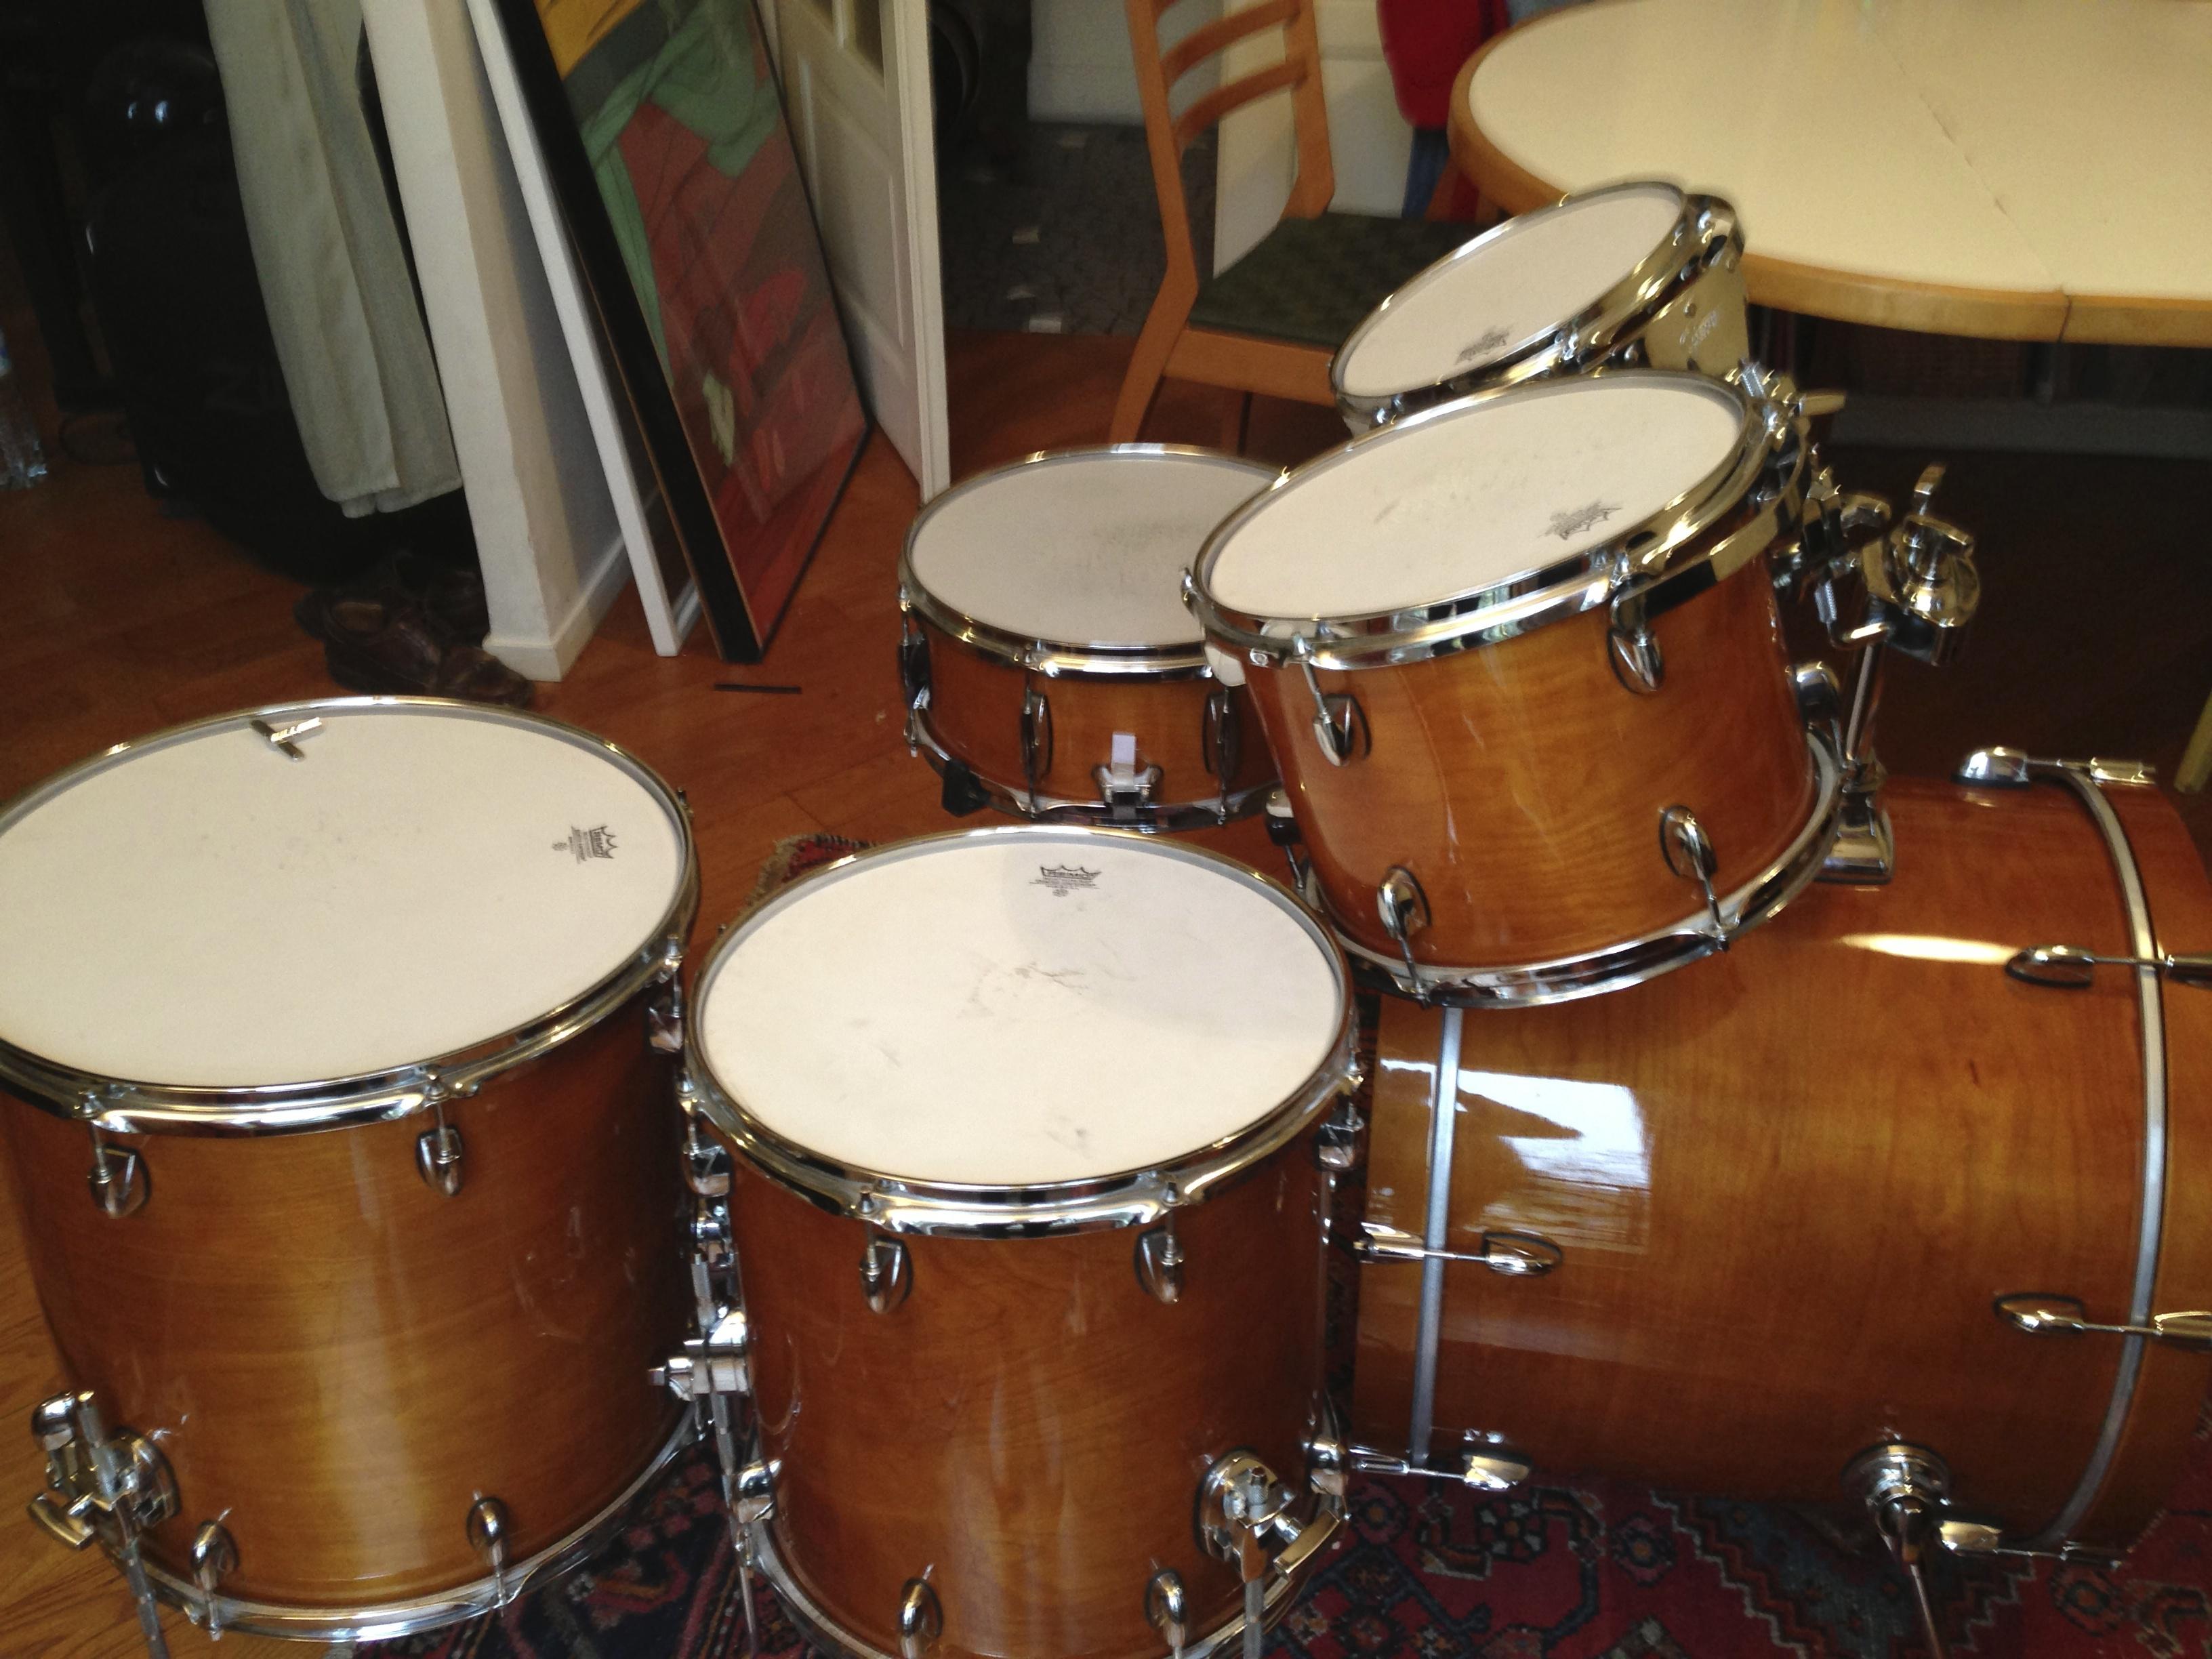 gretsch catalina maple fusion 22 39 39 amber image 601757 audiofanzine. Black Bedroom Furniture Sets. Home Design Ideas